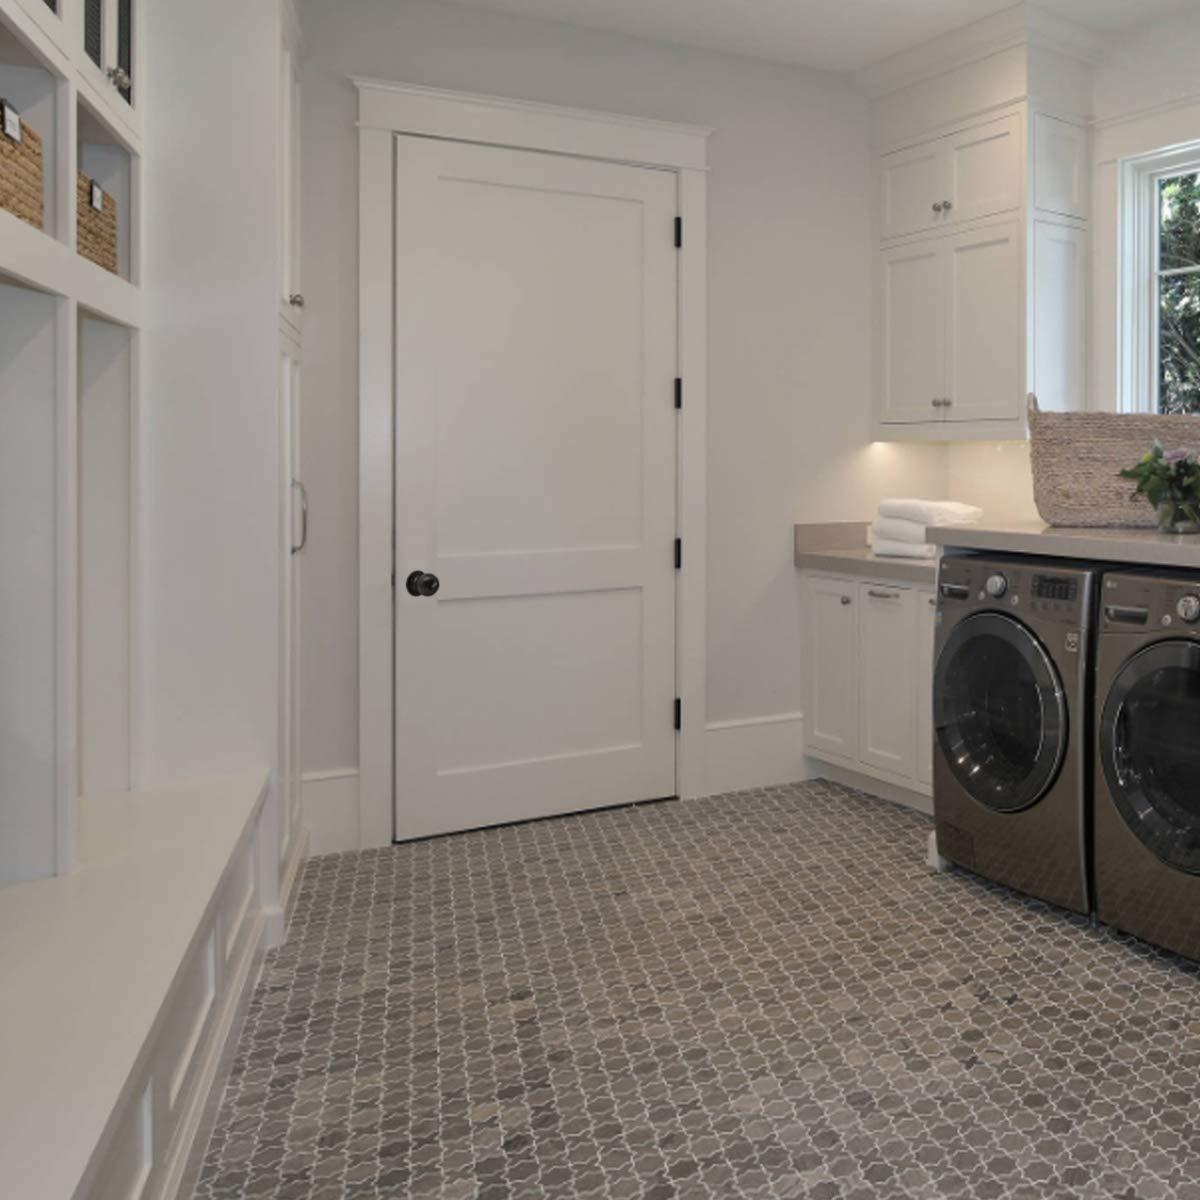 8 Pack Probrico Interior Round Privacy Keyless Door Knobs Door Lock Lockset Without Key Doorknobs Oil Rubbed Bronze for Bedroom and Bathroom-Door Knob 607 by Probrico (Image #2)